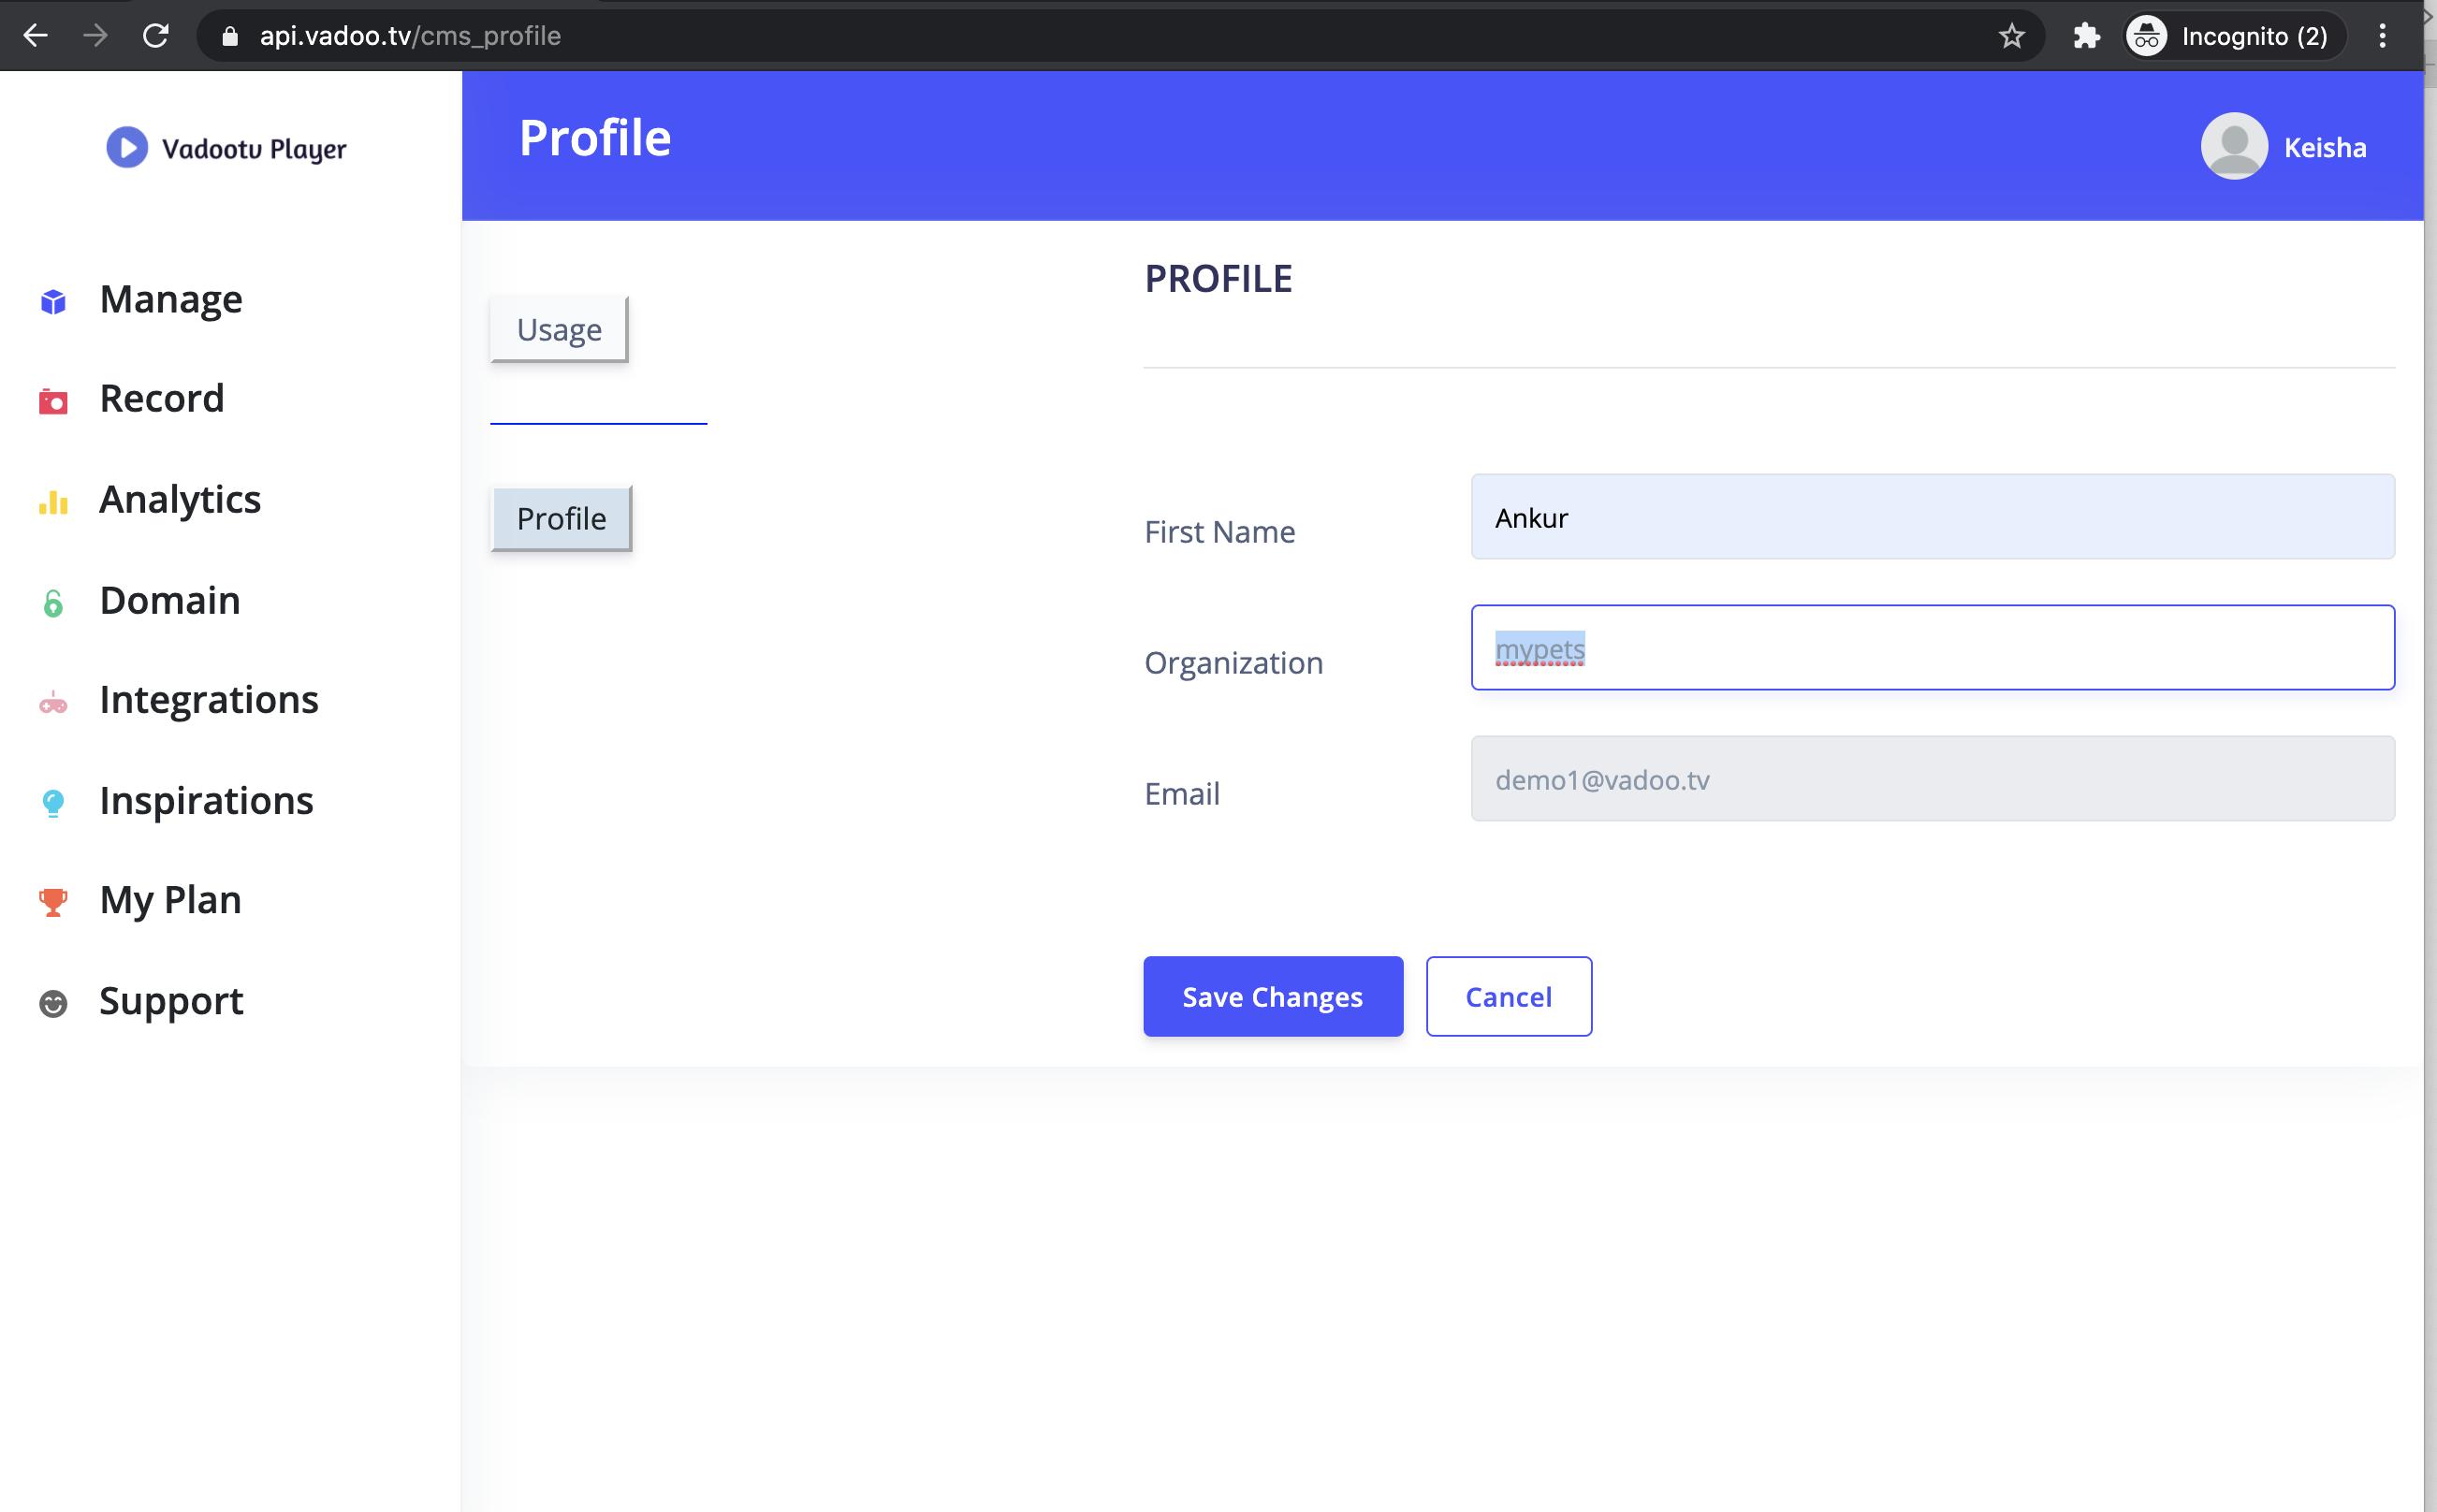 Vadoo creating a profile